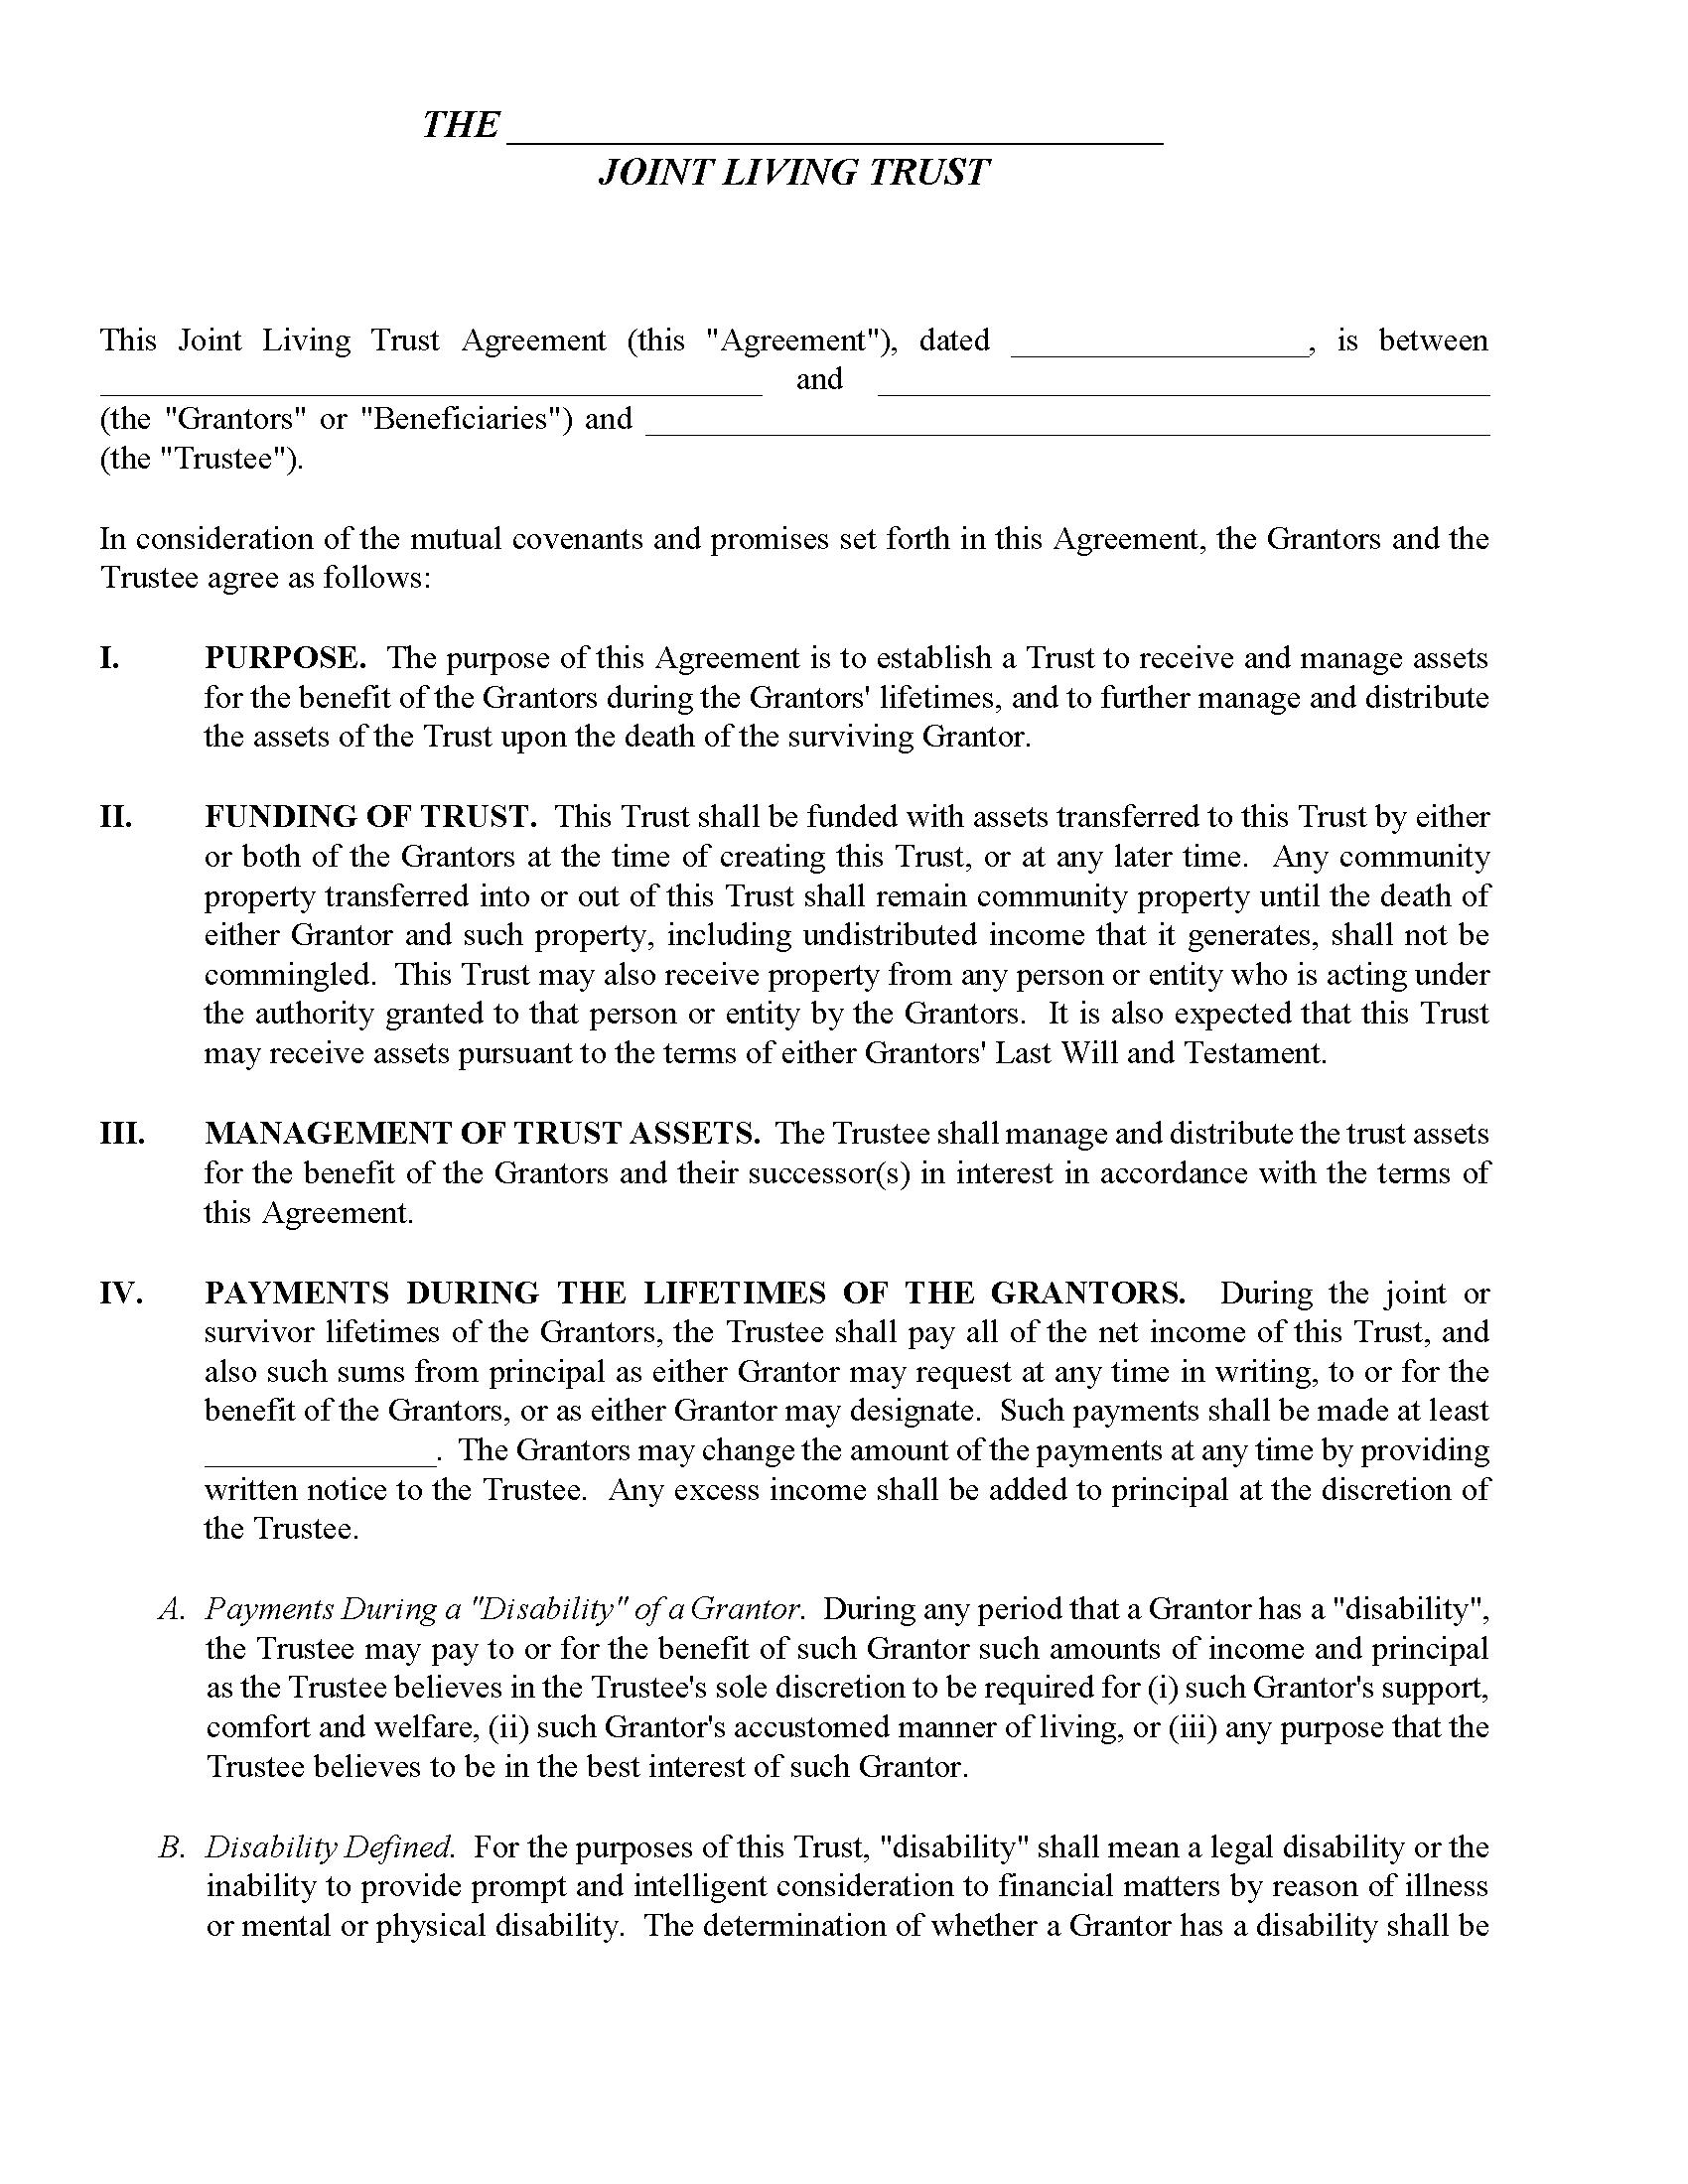 Arizona Joint Living Trust Form